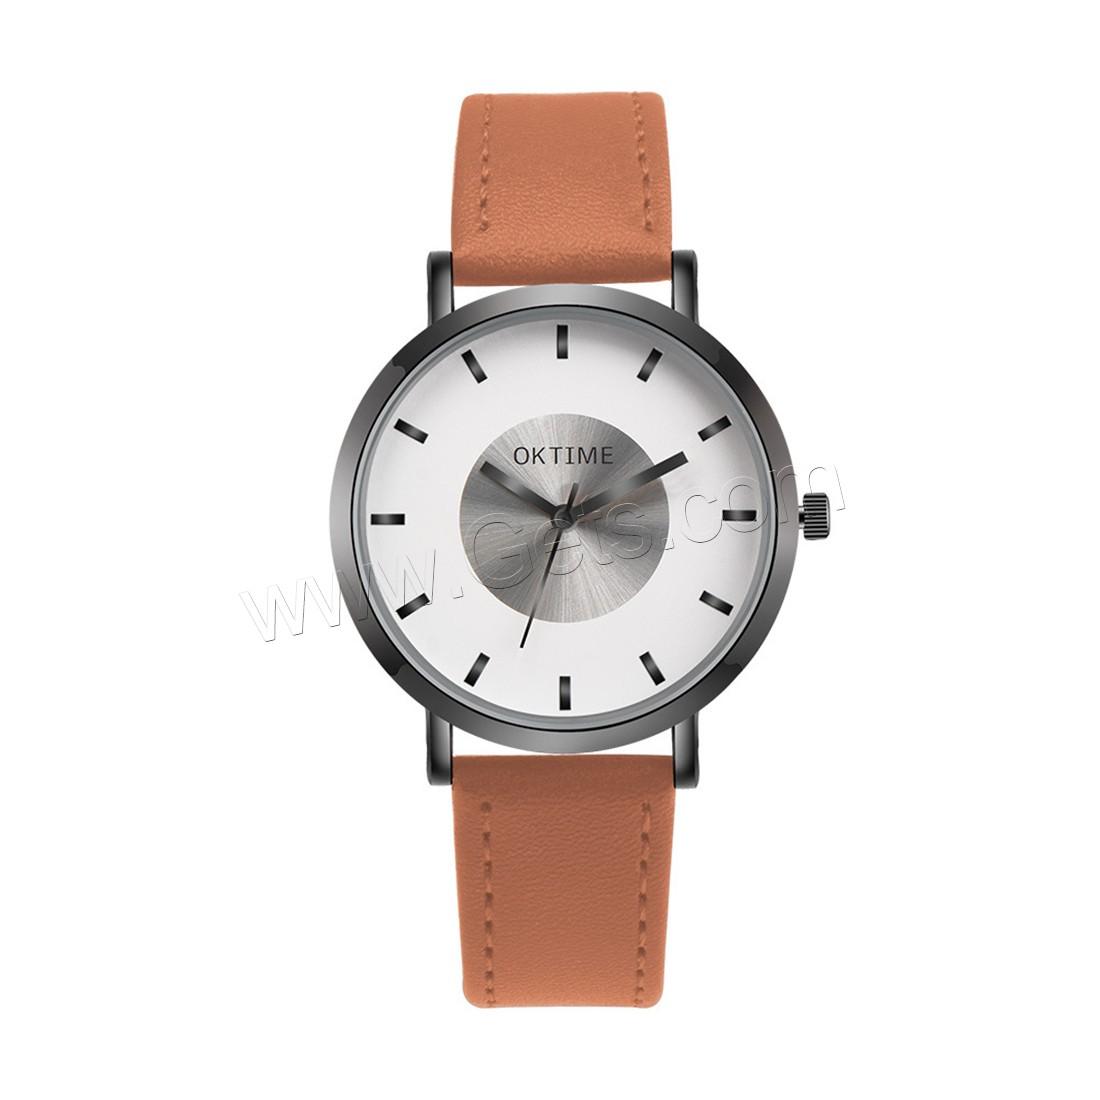 unisexe armbanduhr pu leder mit glas edelstahl zinklegierung schw rzen keine l ca 8 5. Black Bedroom Furniture Sets. Home Design Ideas